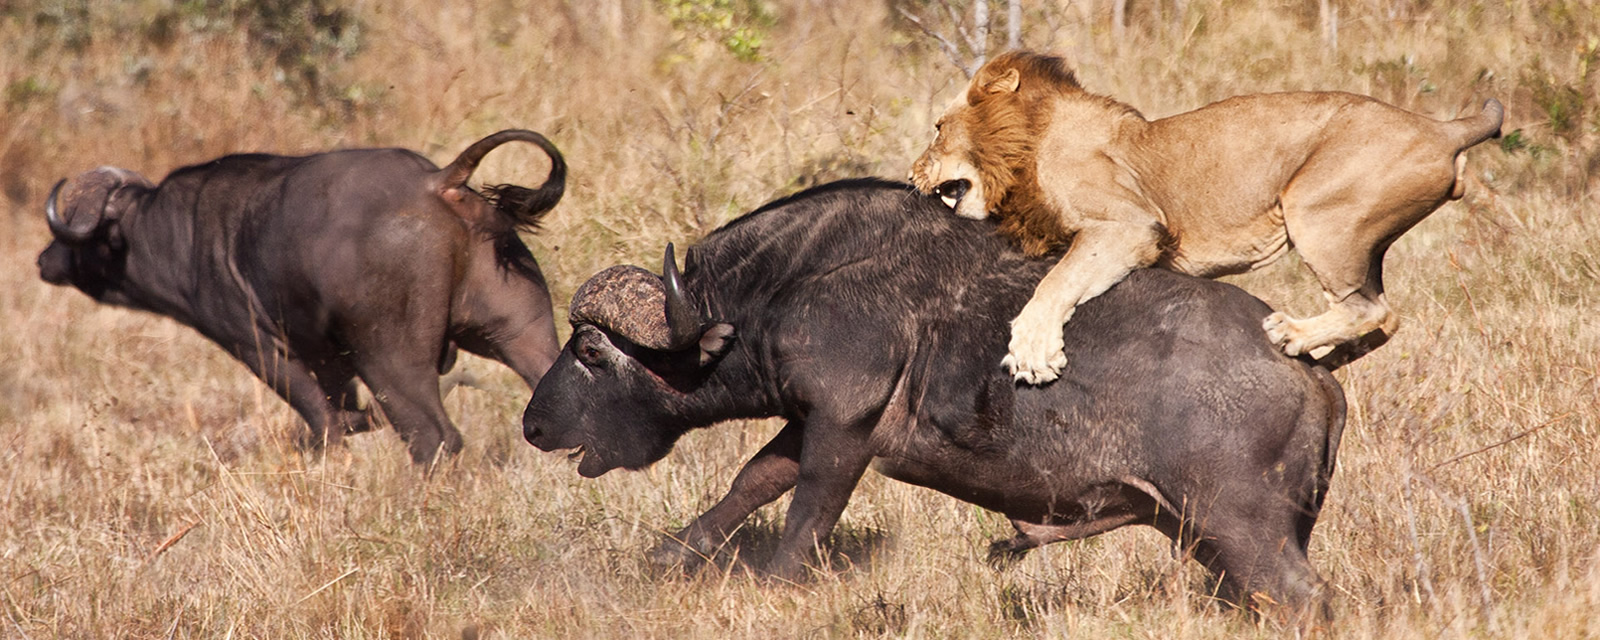 5 Days Kidepo Wildlife Safari